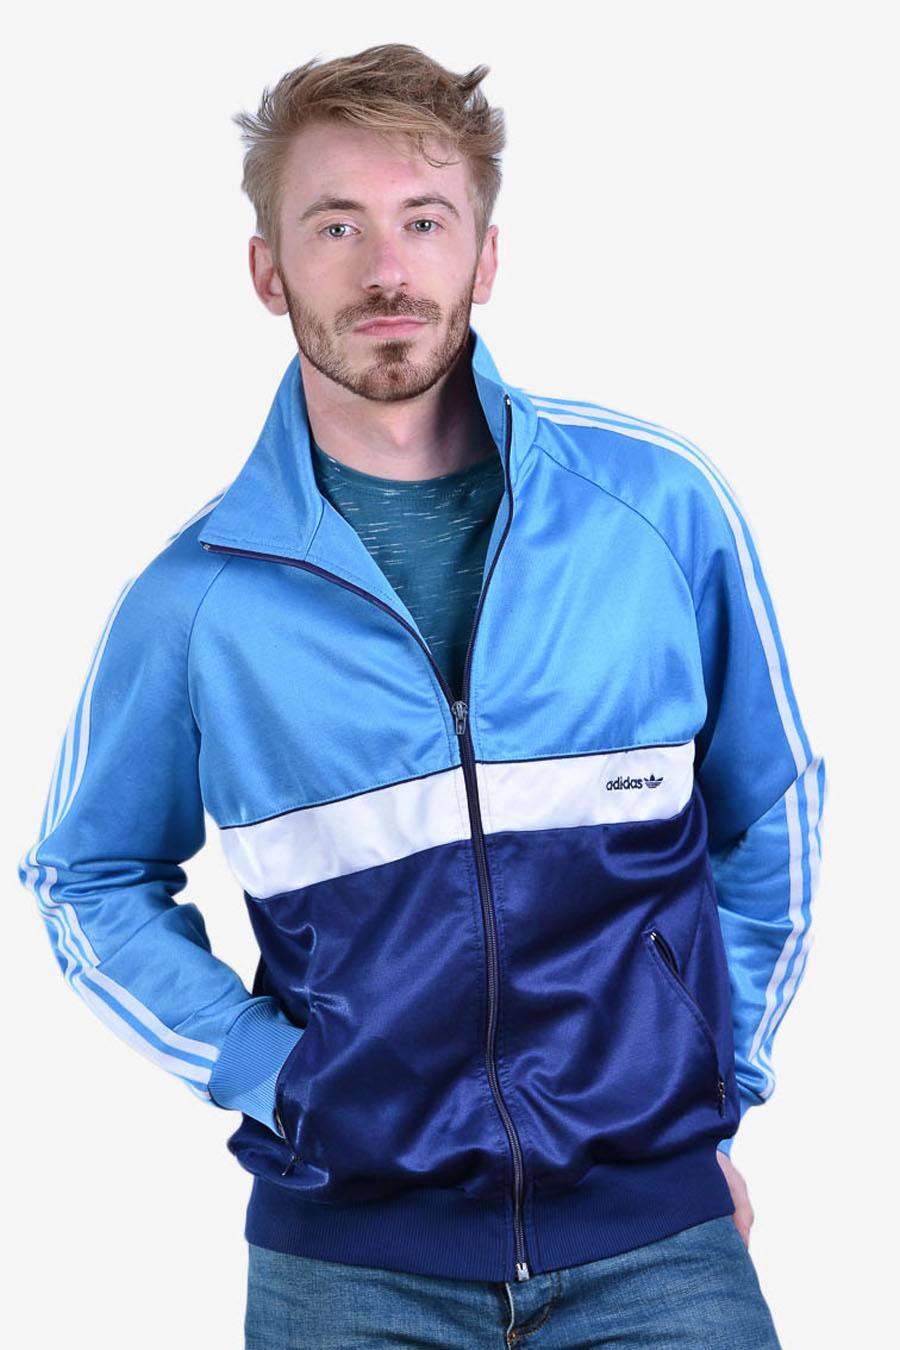 Vintage men's Adidas track jacket